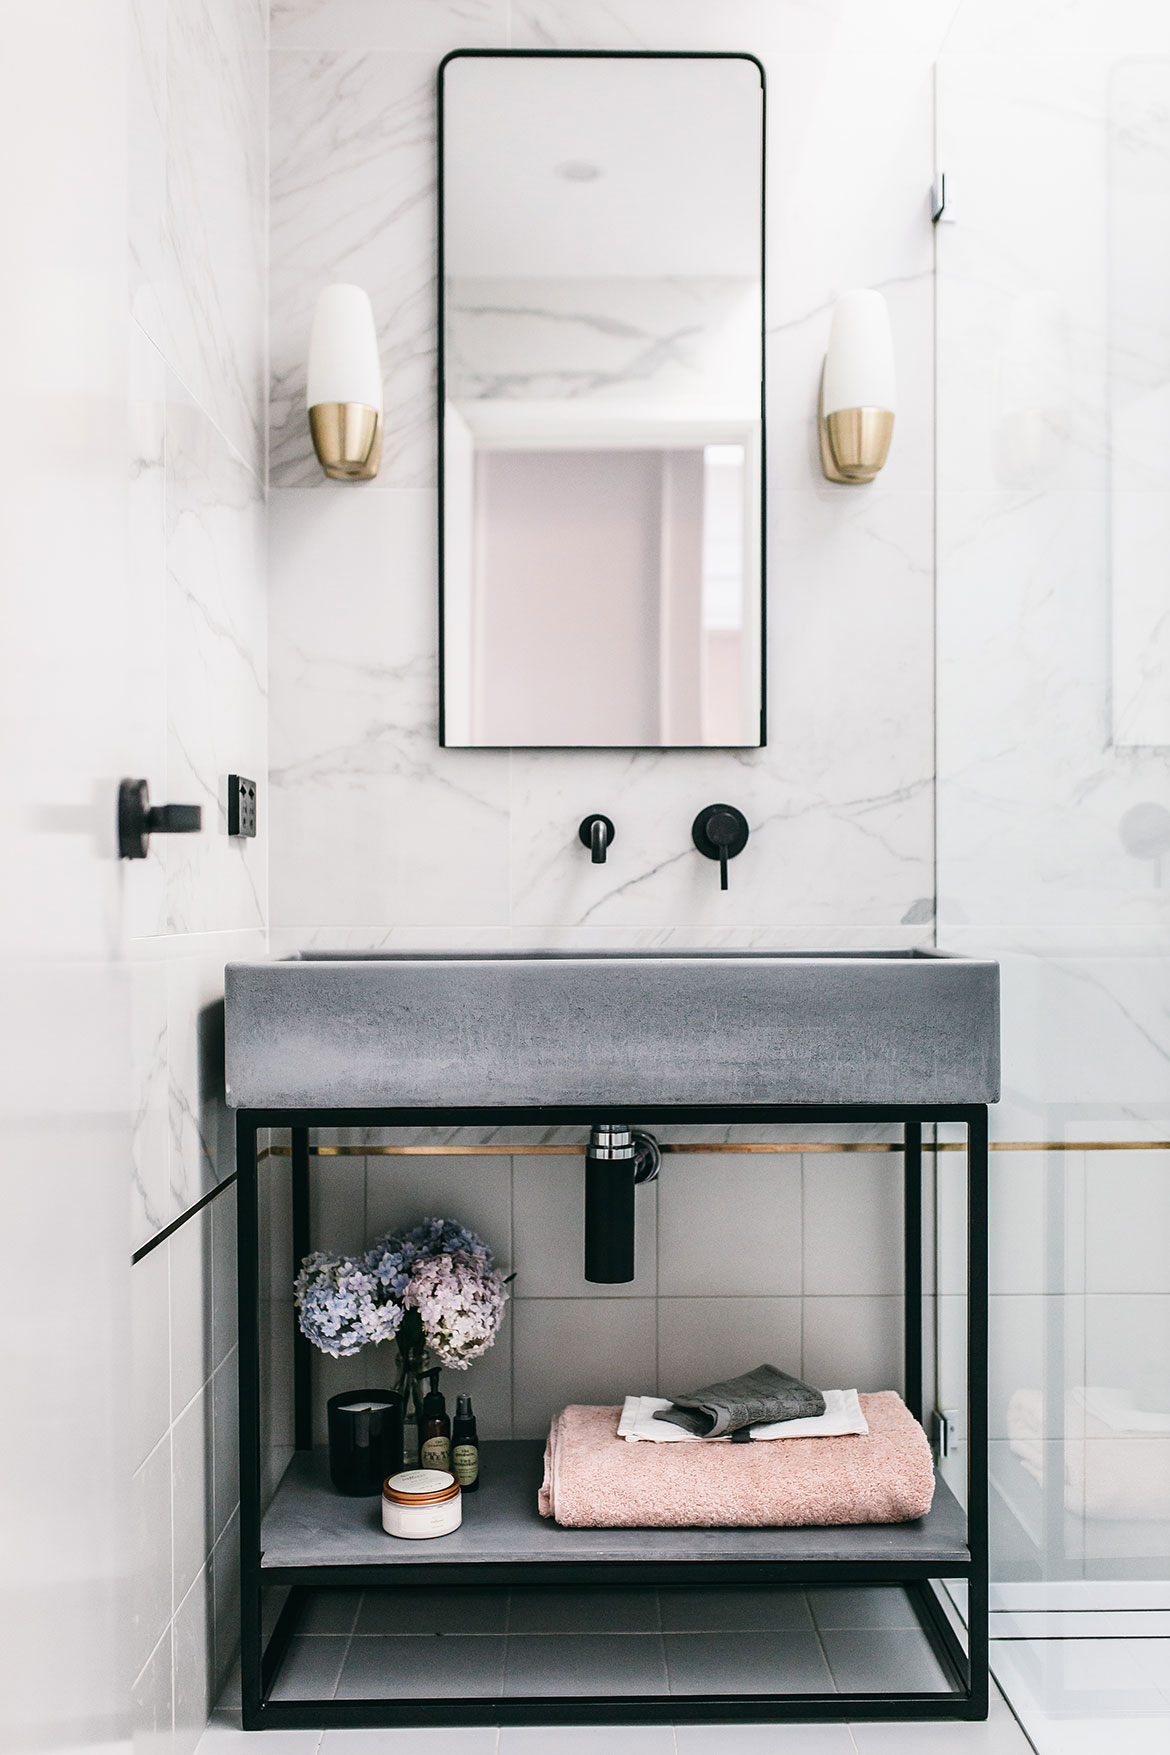 Nood Co Concrete bathroom vanity